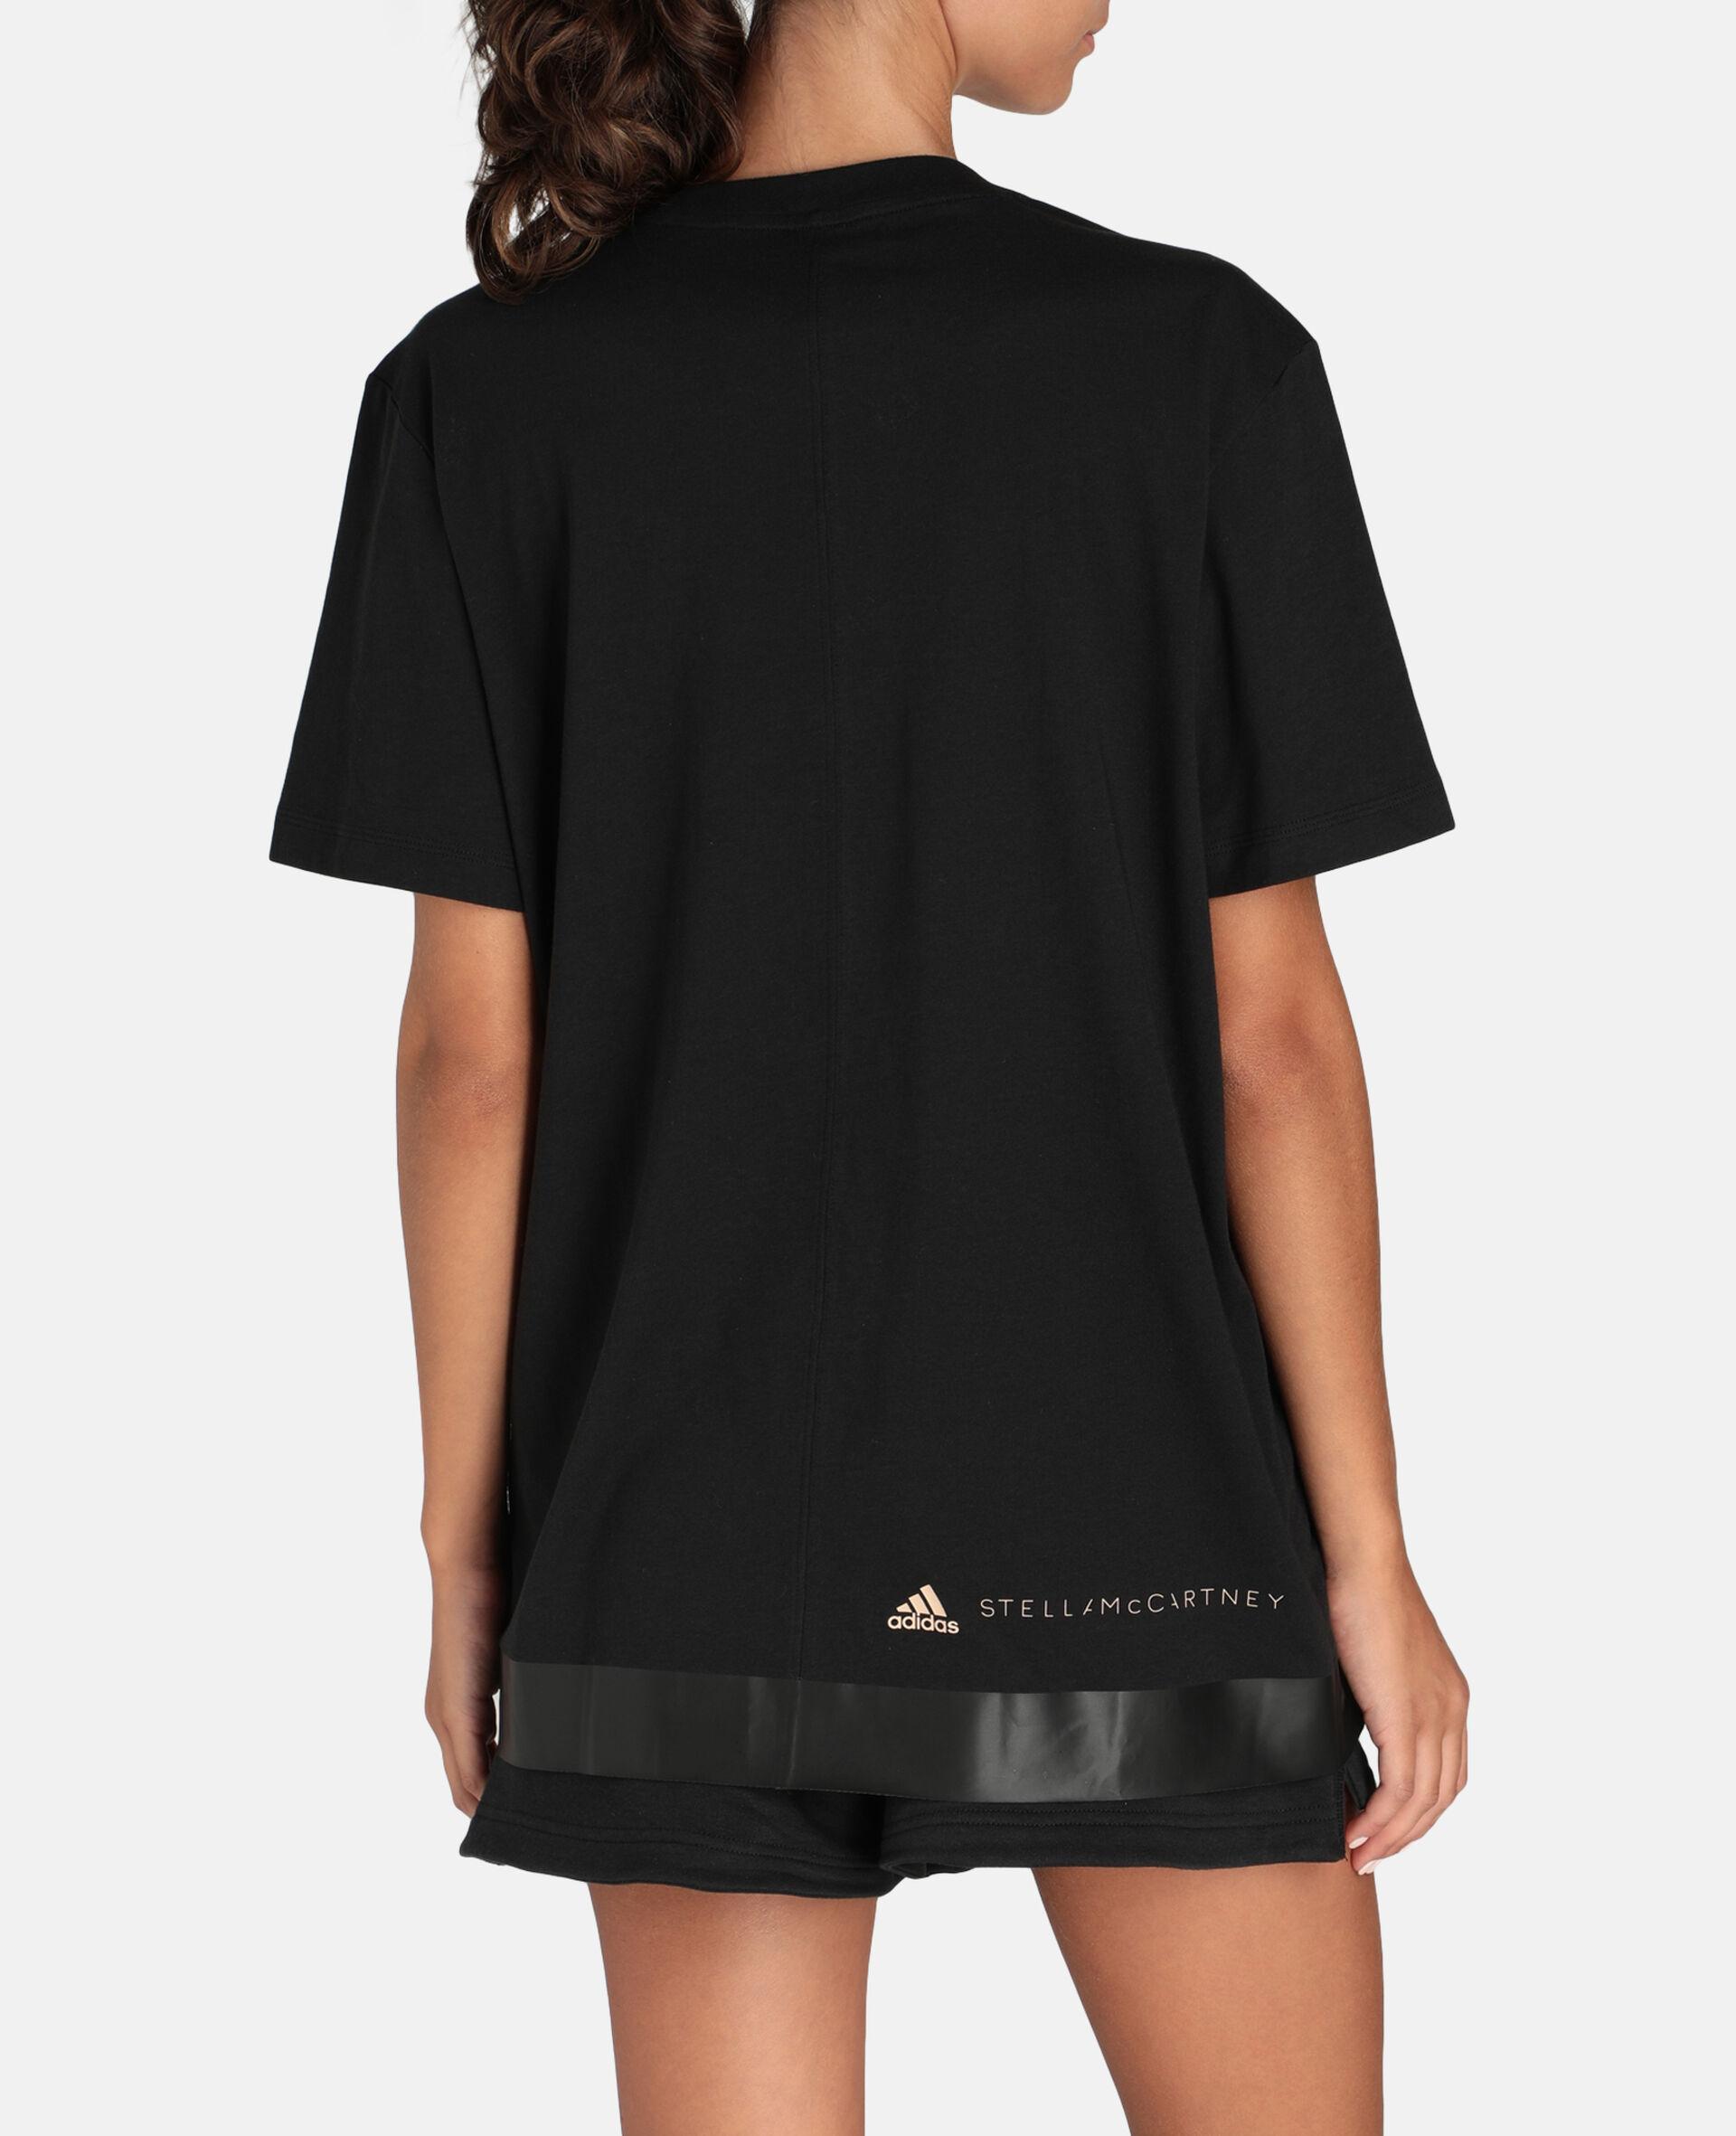 Schwarzes Sport-T-Shirt-Schwarz-large image number 2